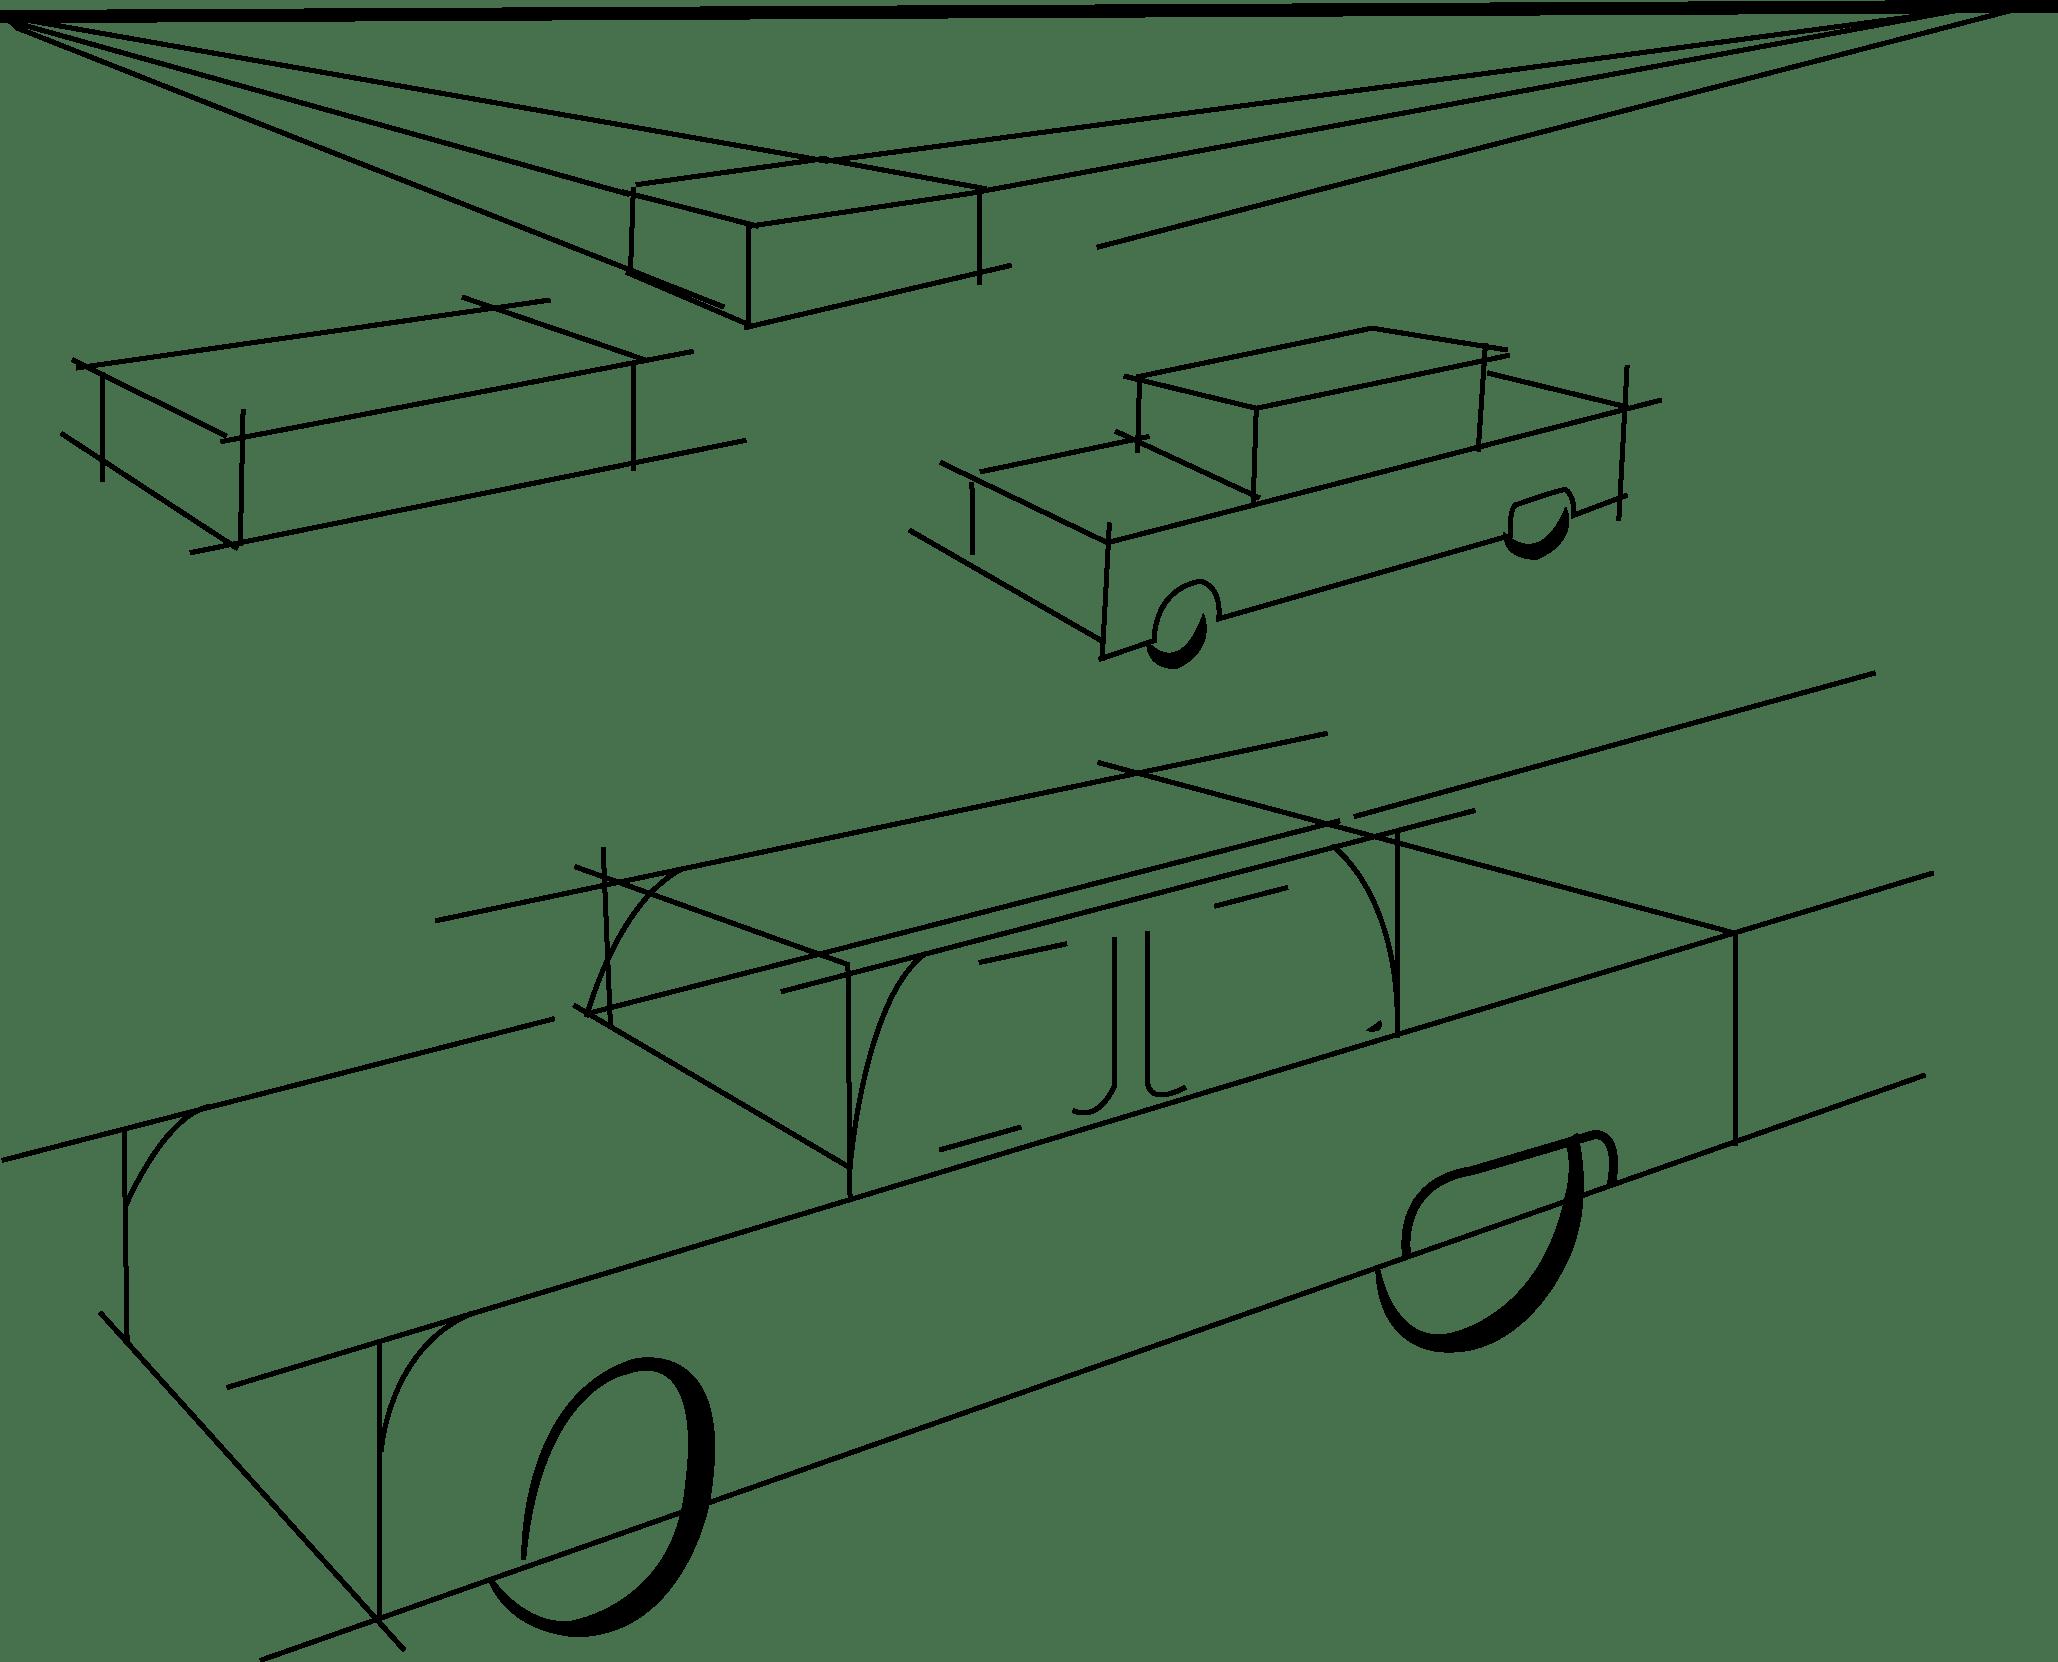 2058x1662 sketching automotive design course automobile body design